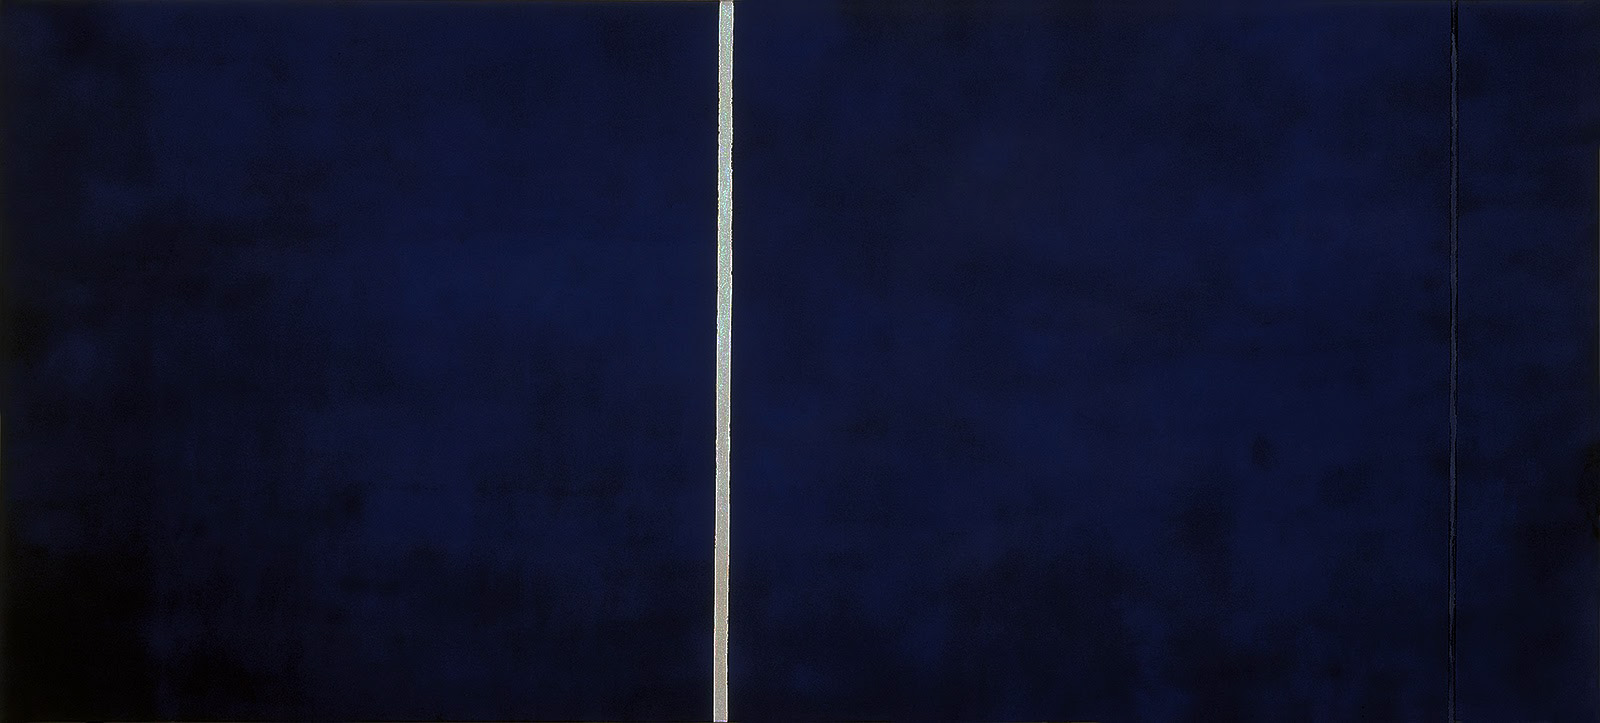 Barnett Newman,  Cathedra magna , 1951, Stedelijk Museum, Amsterdam.